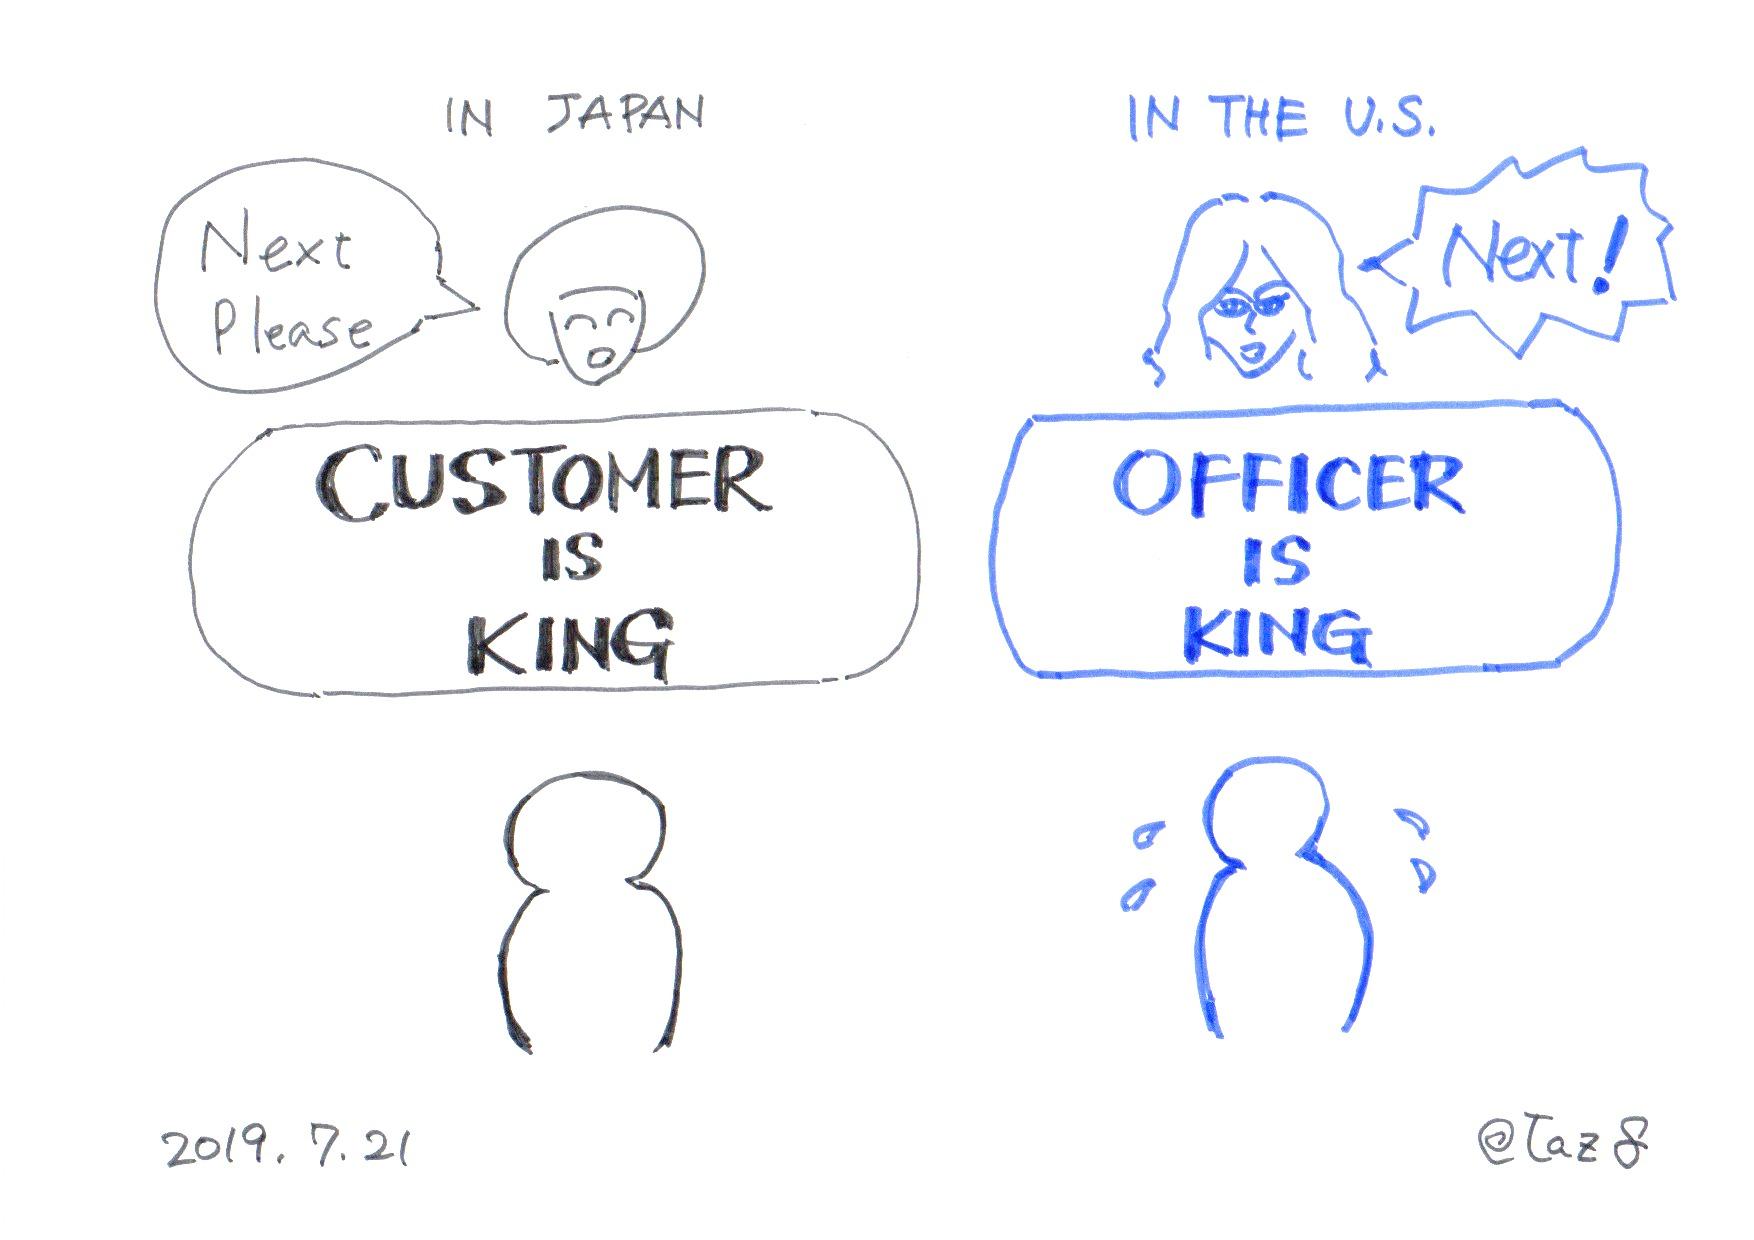 Customer is king Image